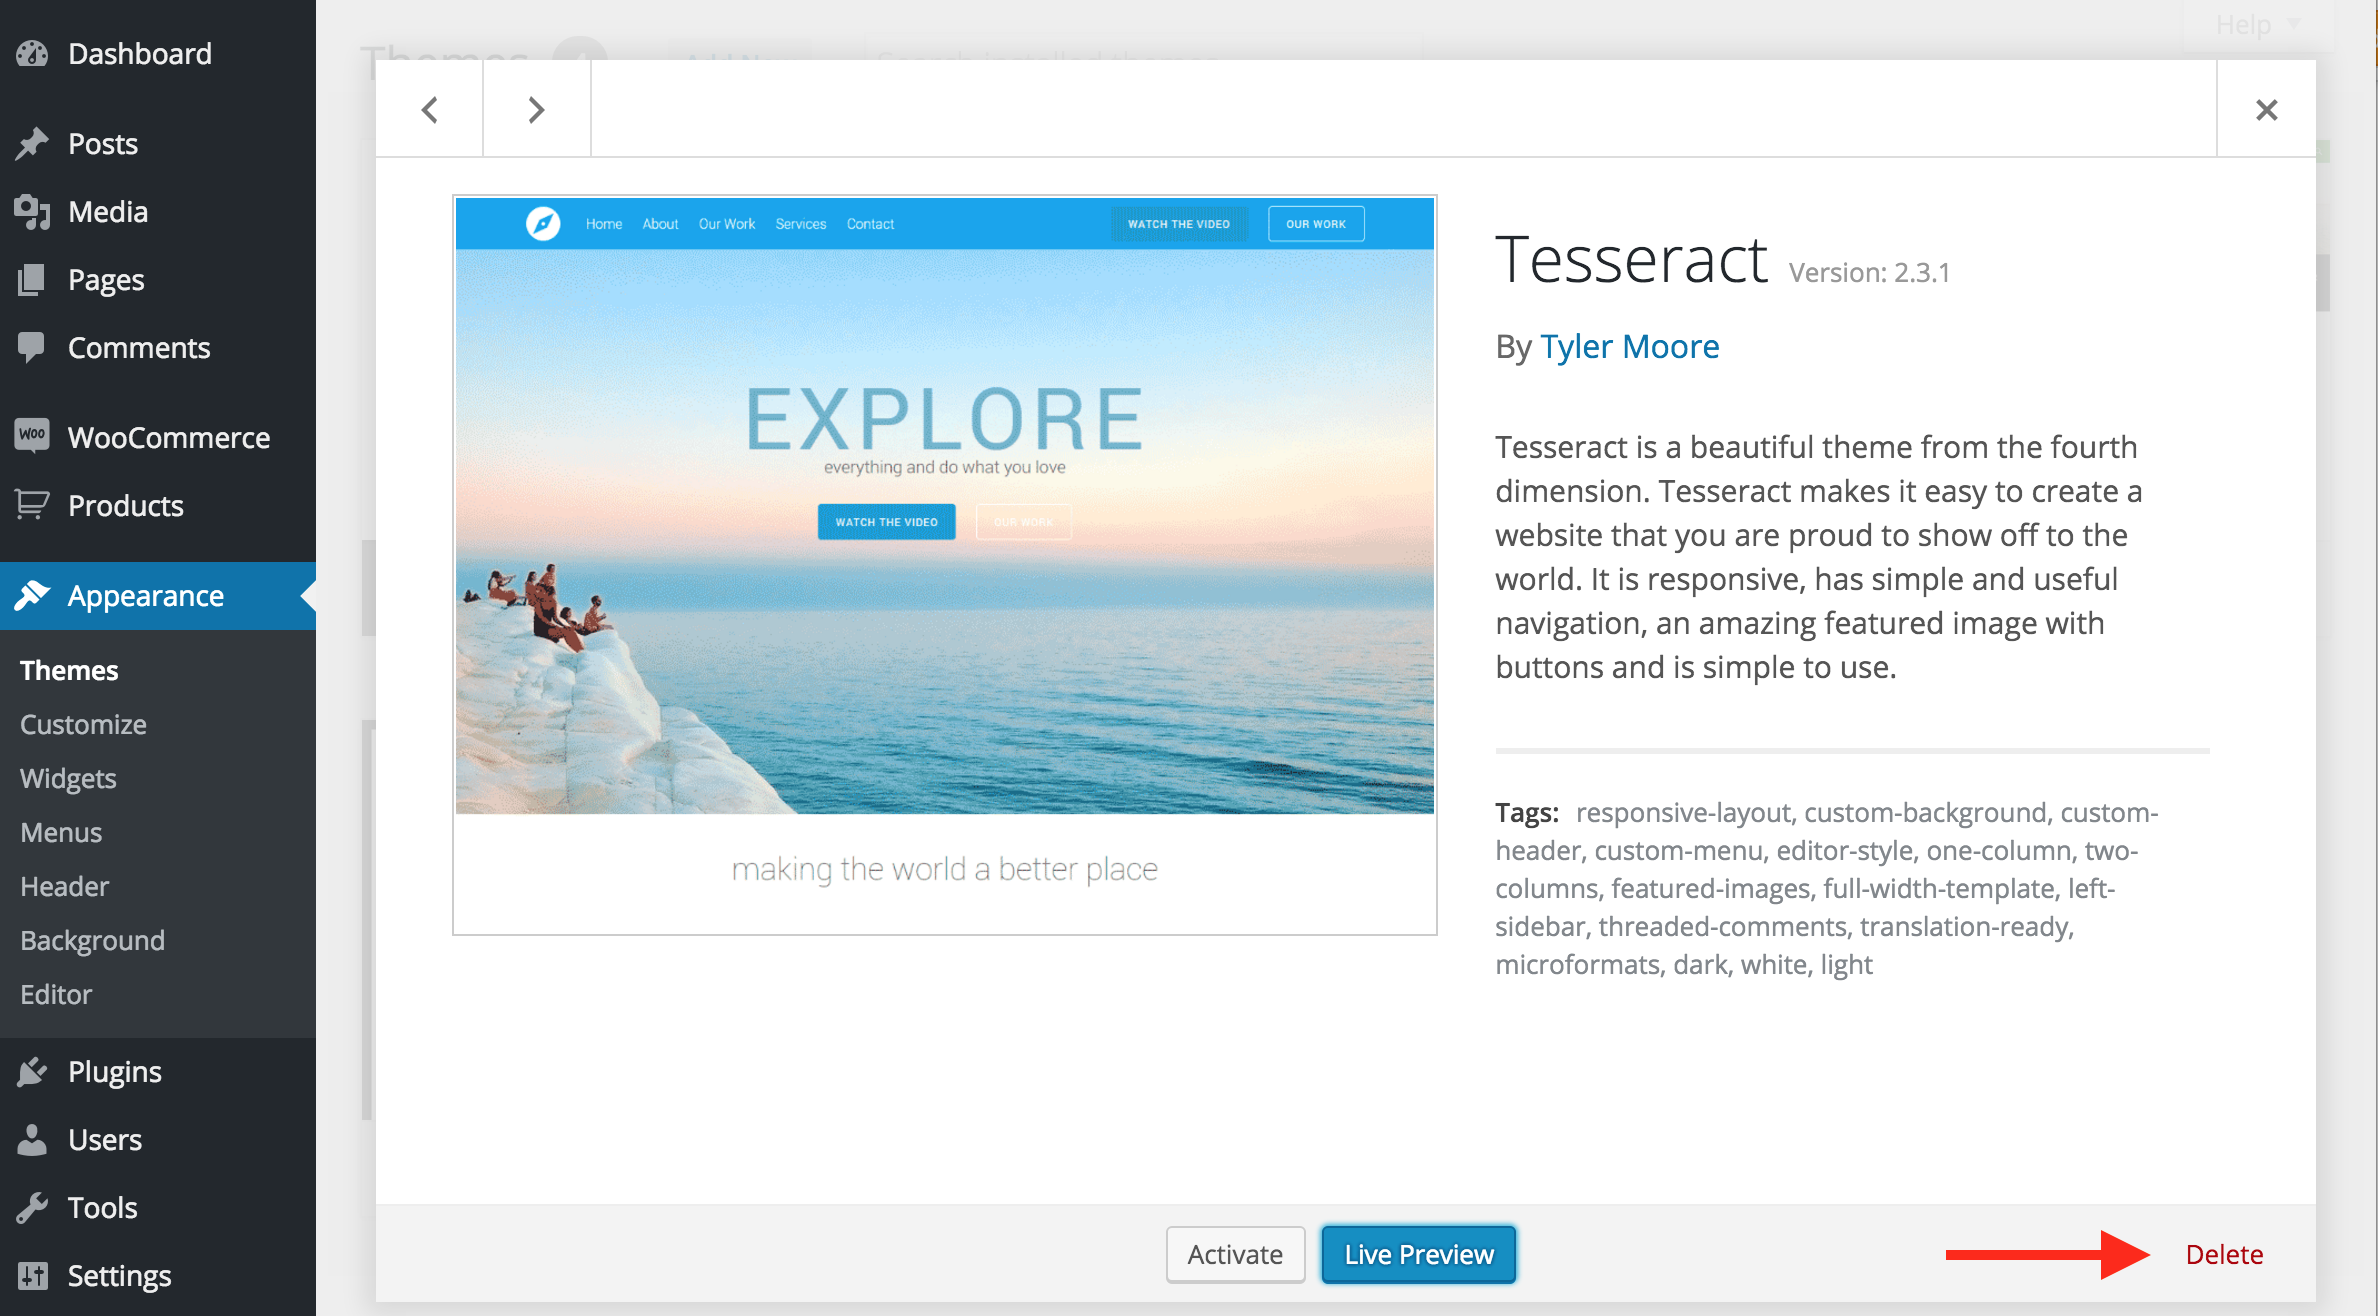 News: Tesseract, Progress Report- Tesseract, Progress Report ...